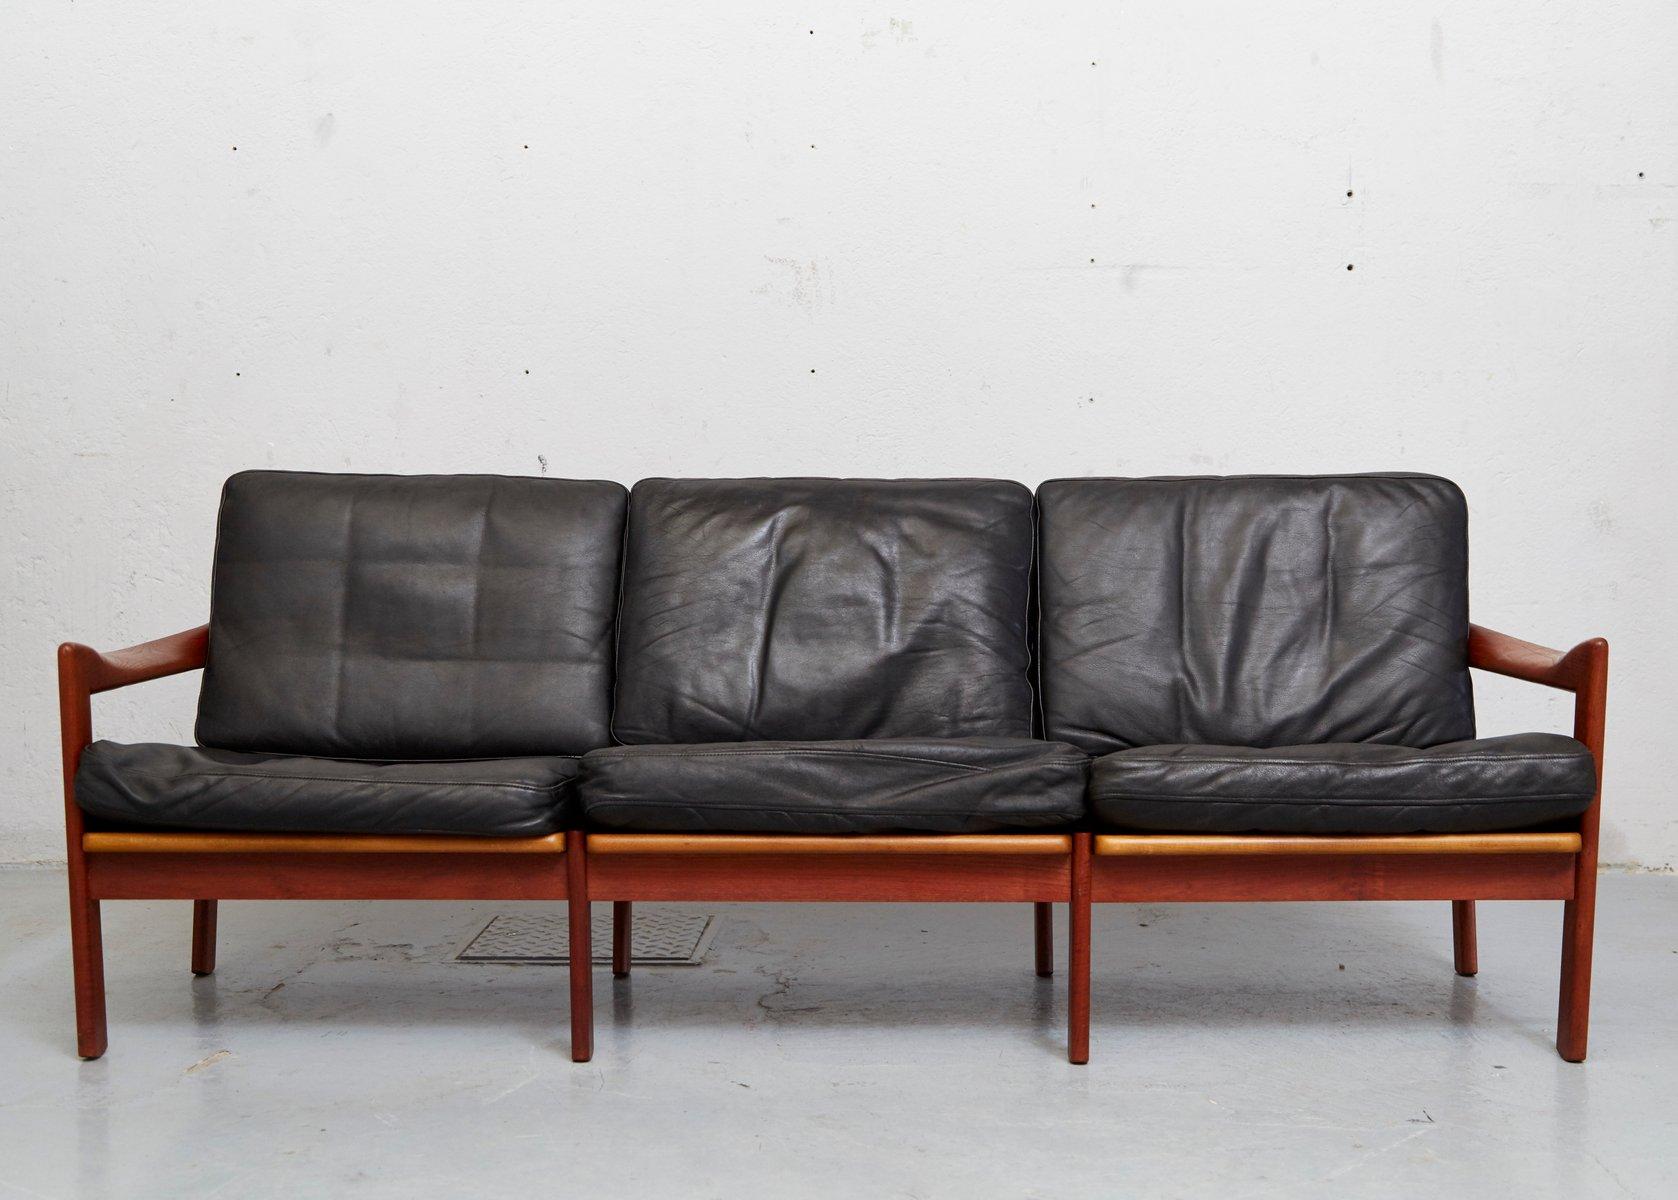 Mid Century Teak Leather Sofa By Illum Wikkelsø For Niels Eilersen